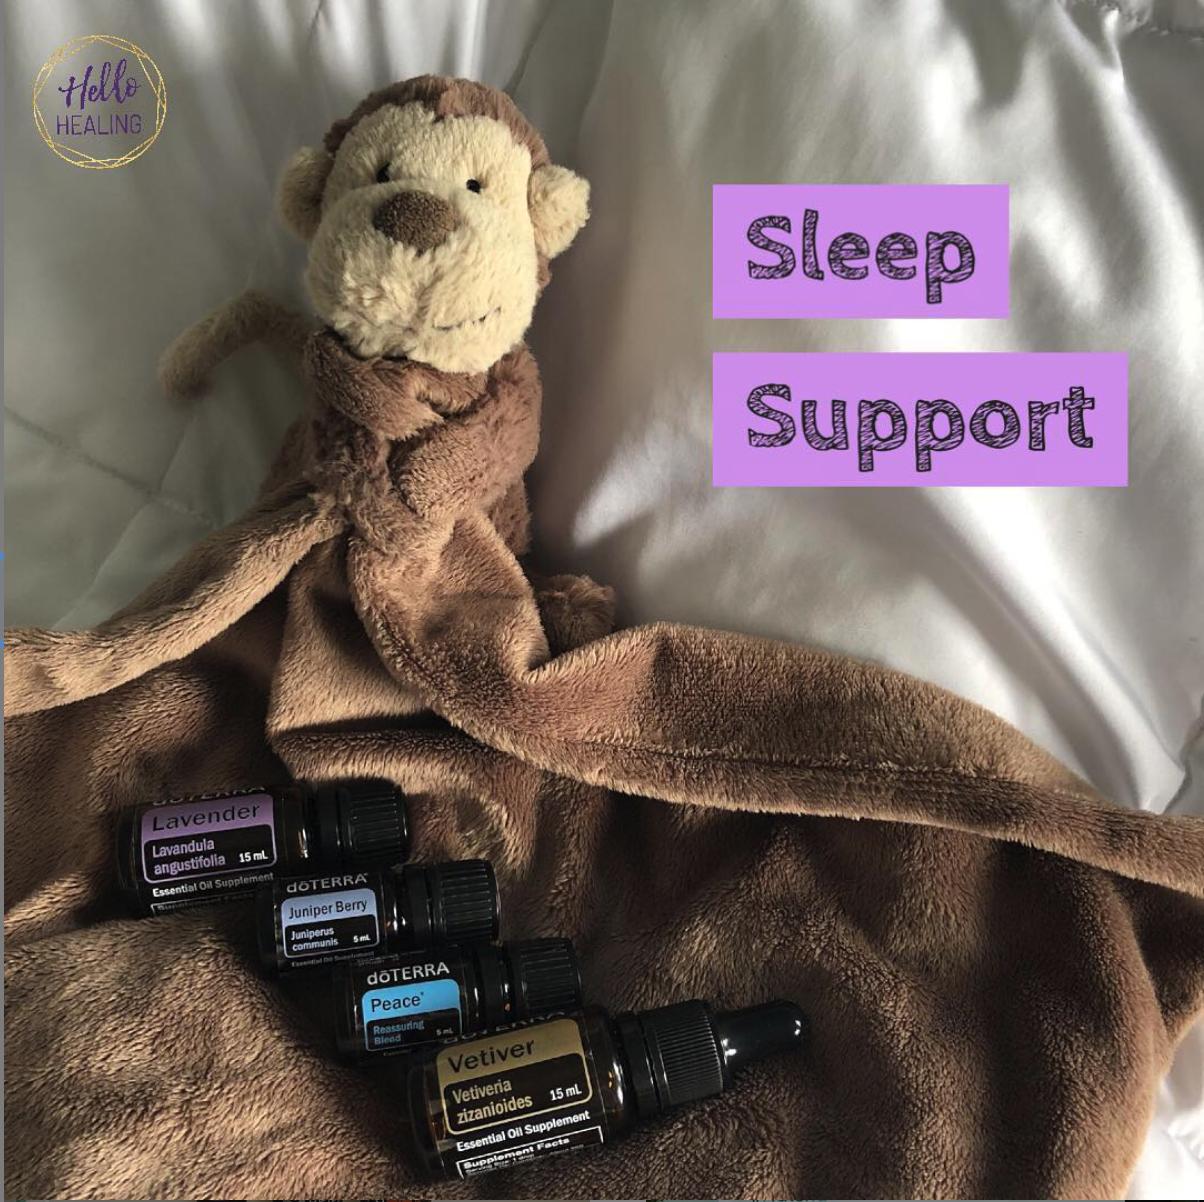 essential oils for sleep: vetiver, juniper berry, lavender, peace blend